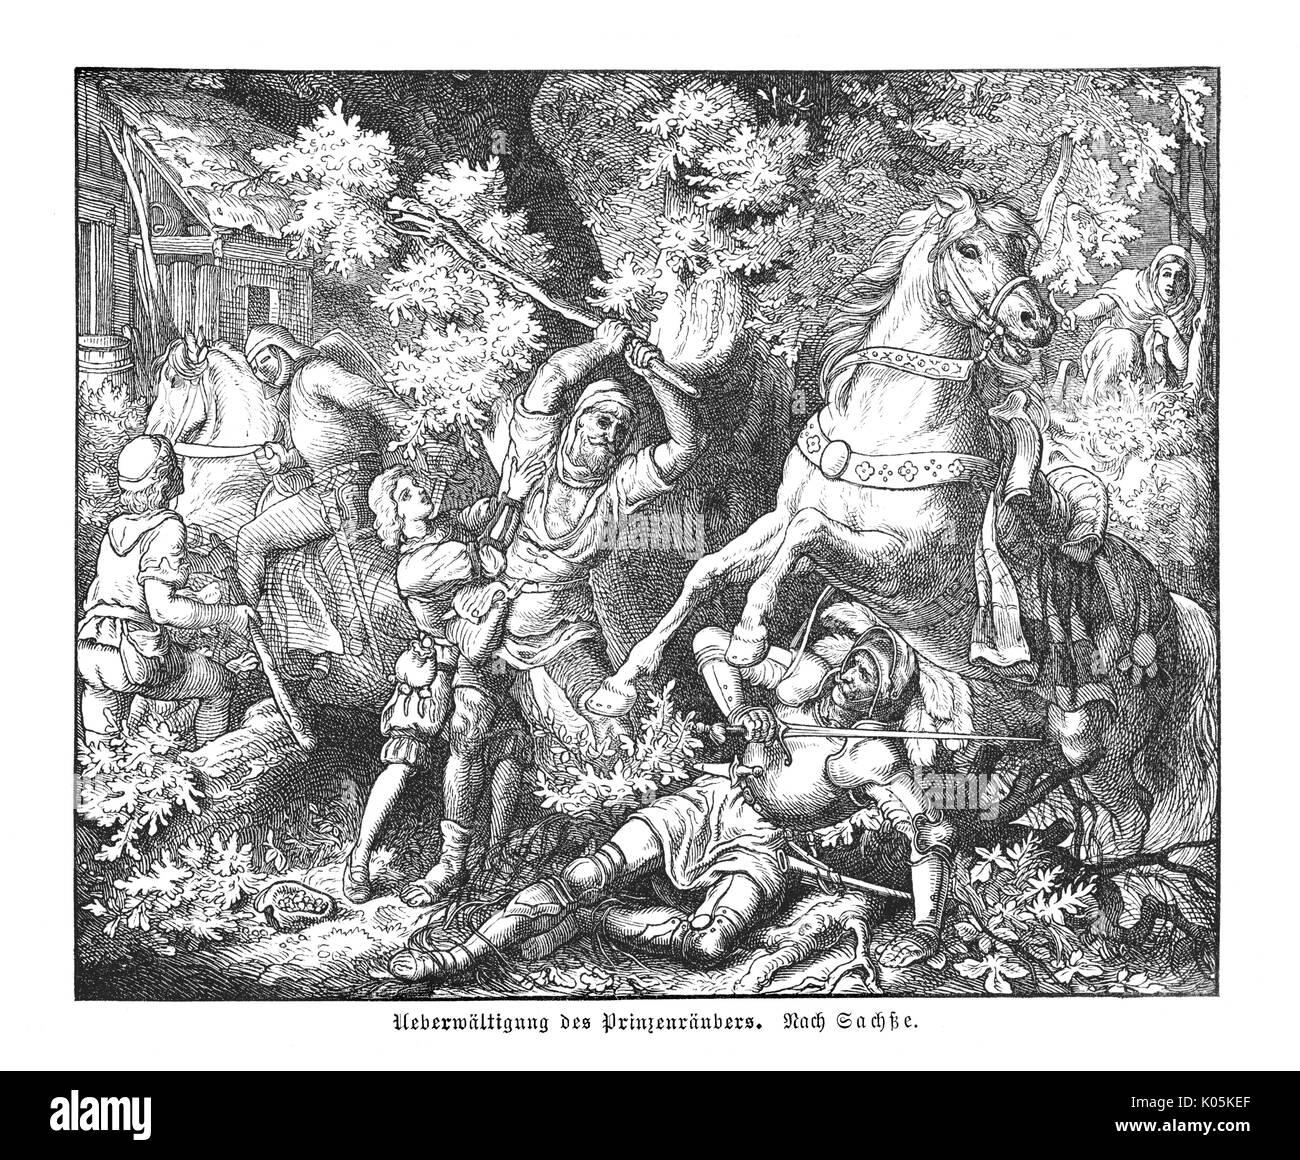 The defeat of the  'Prinzenraubers'         Date: circa 1459 - Stock Image